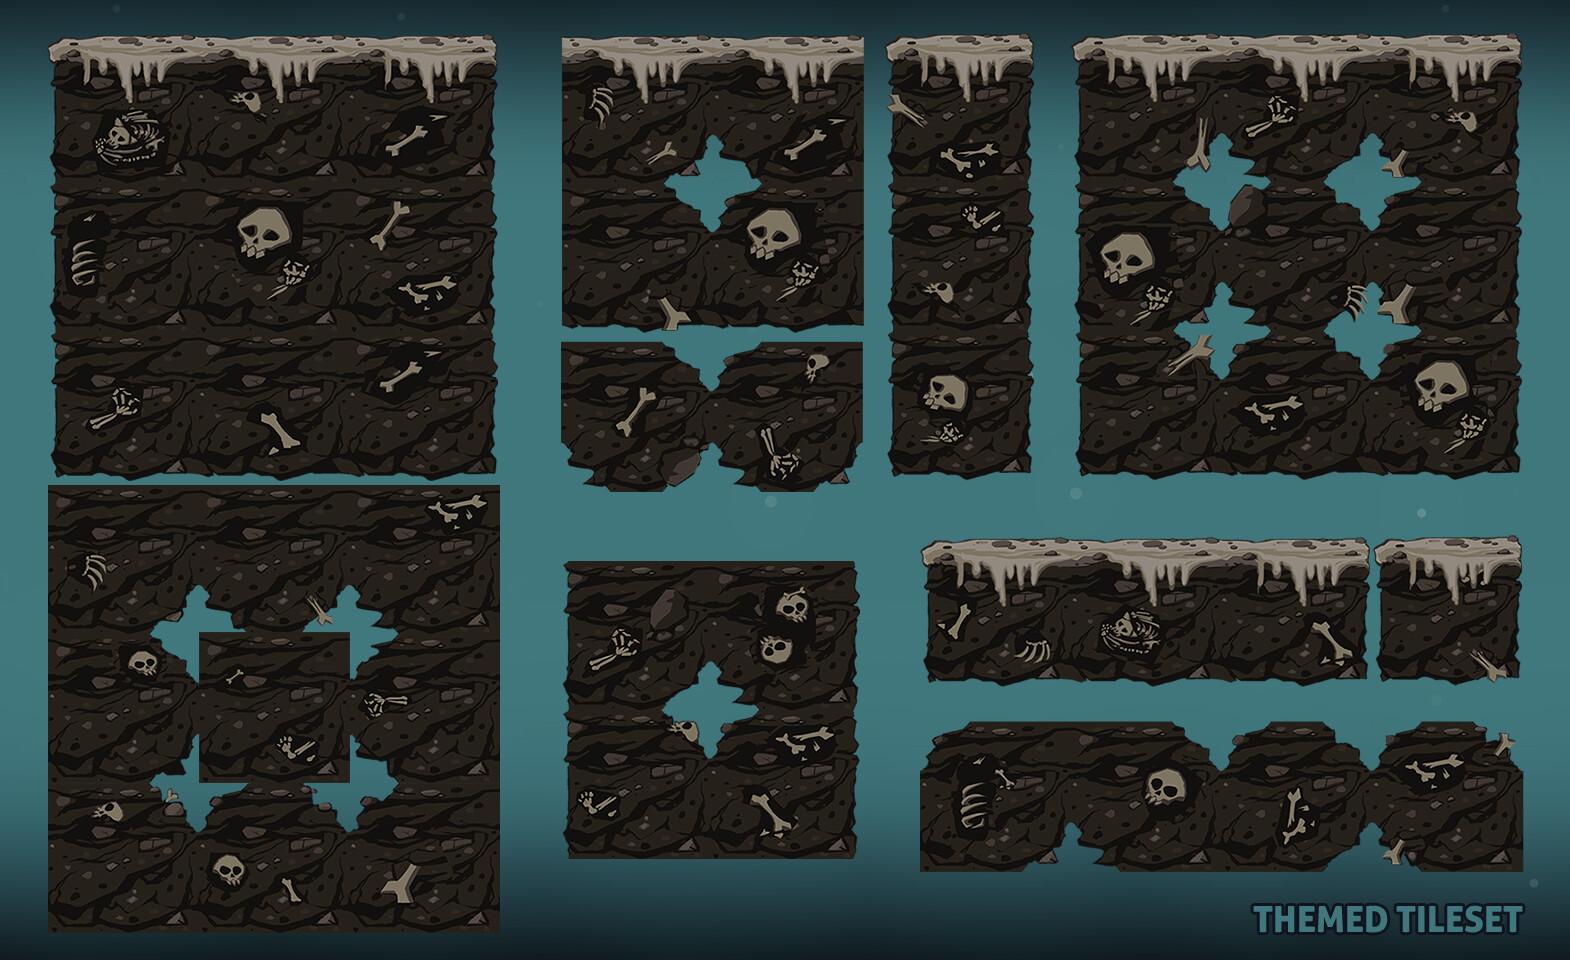 Tiles #1